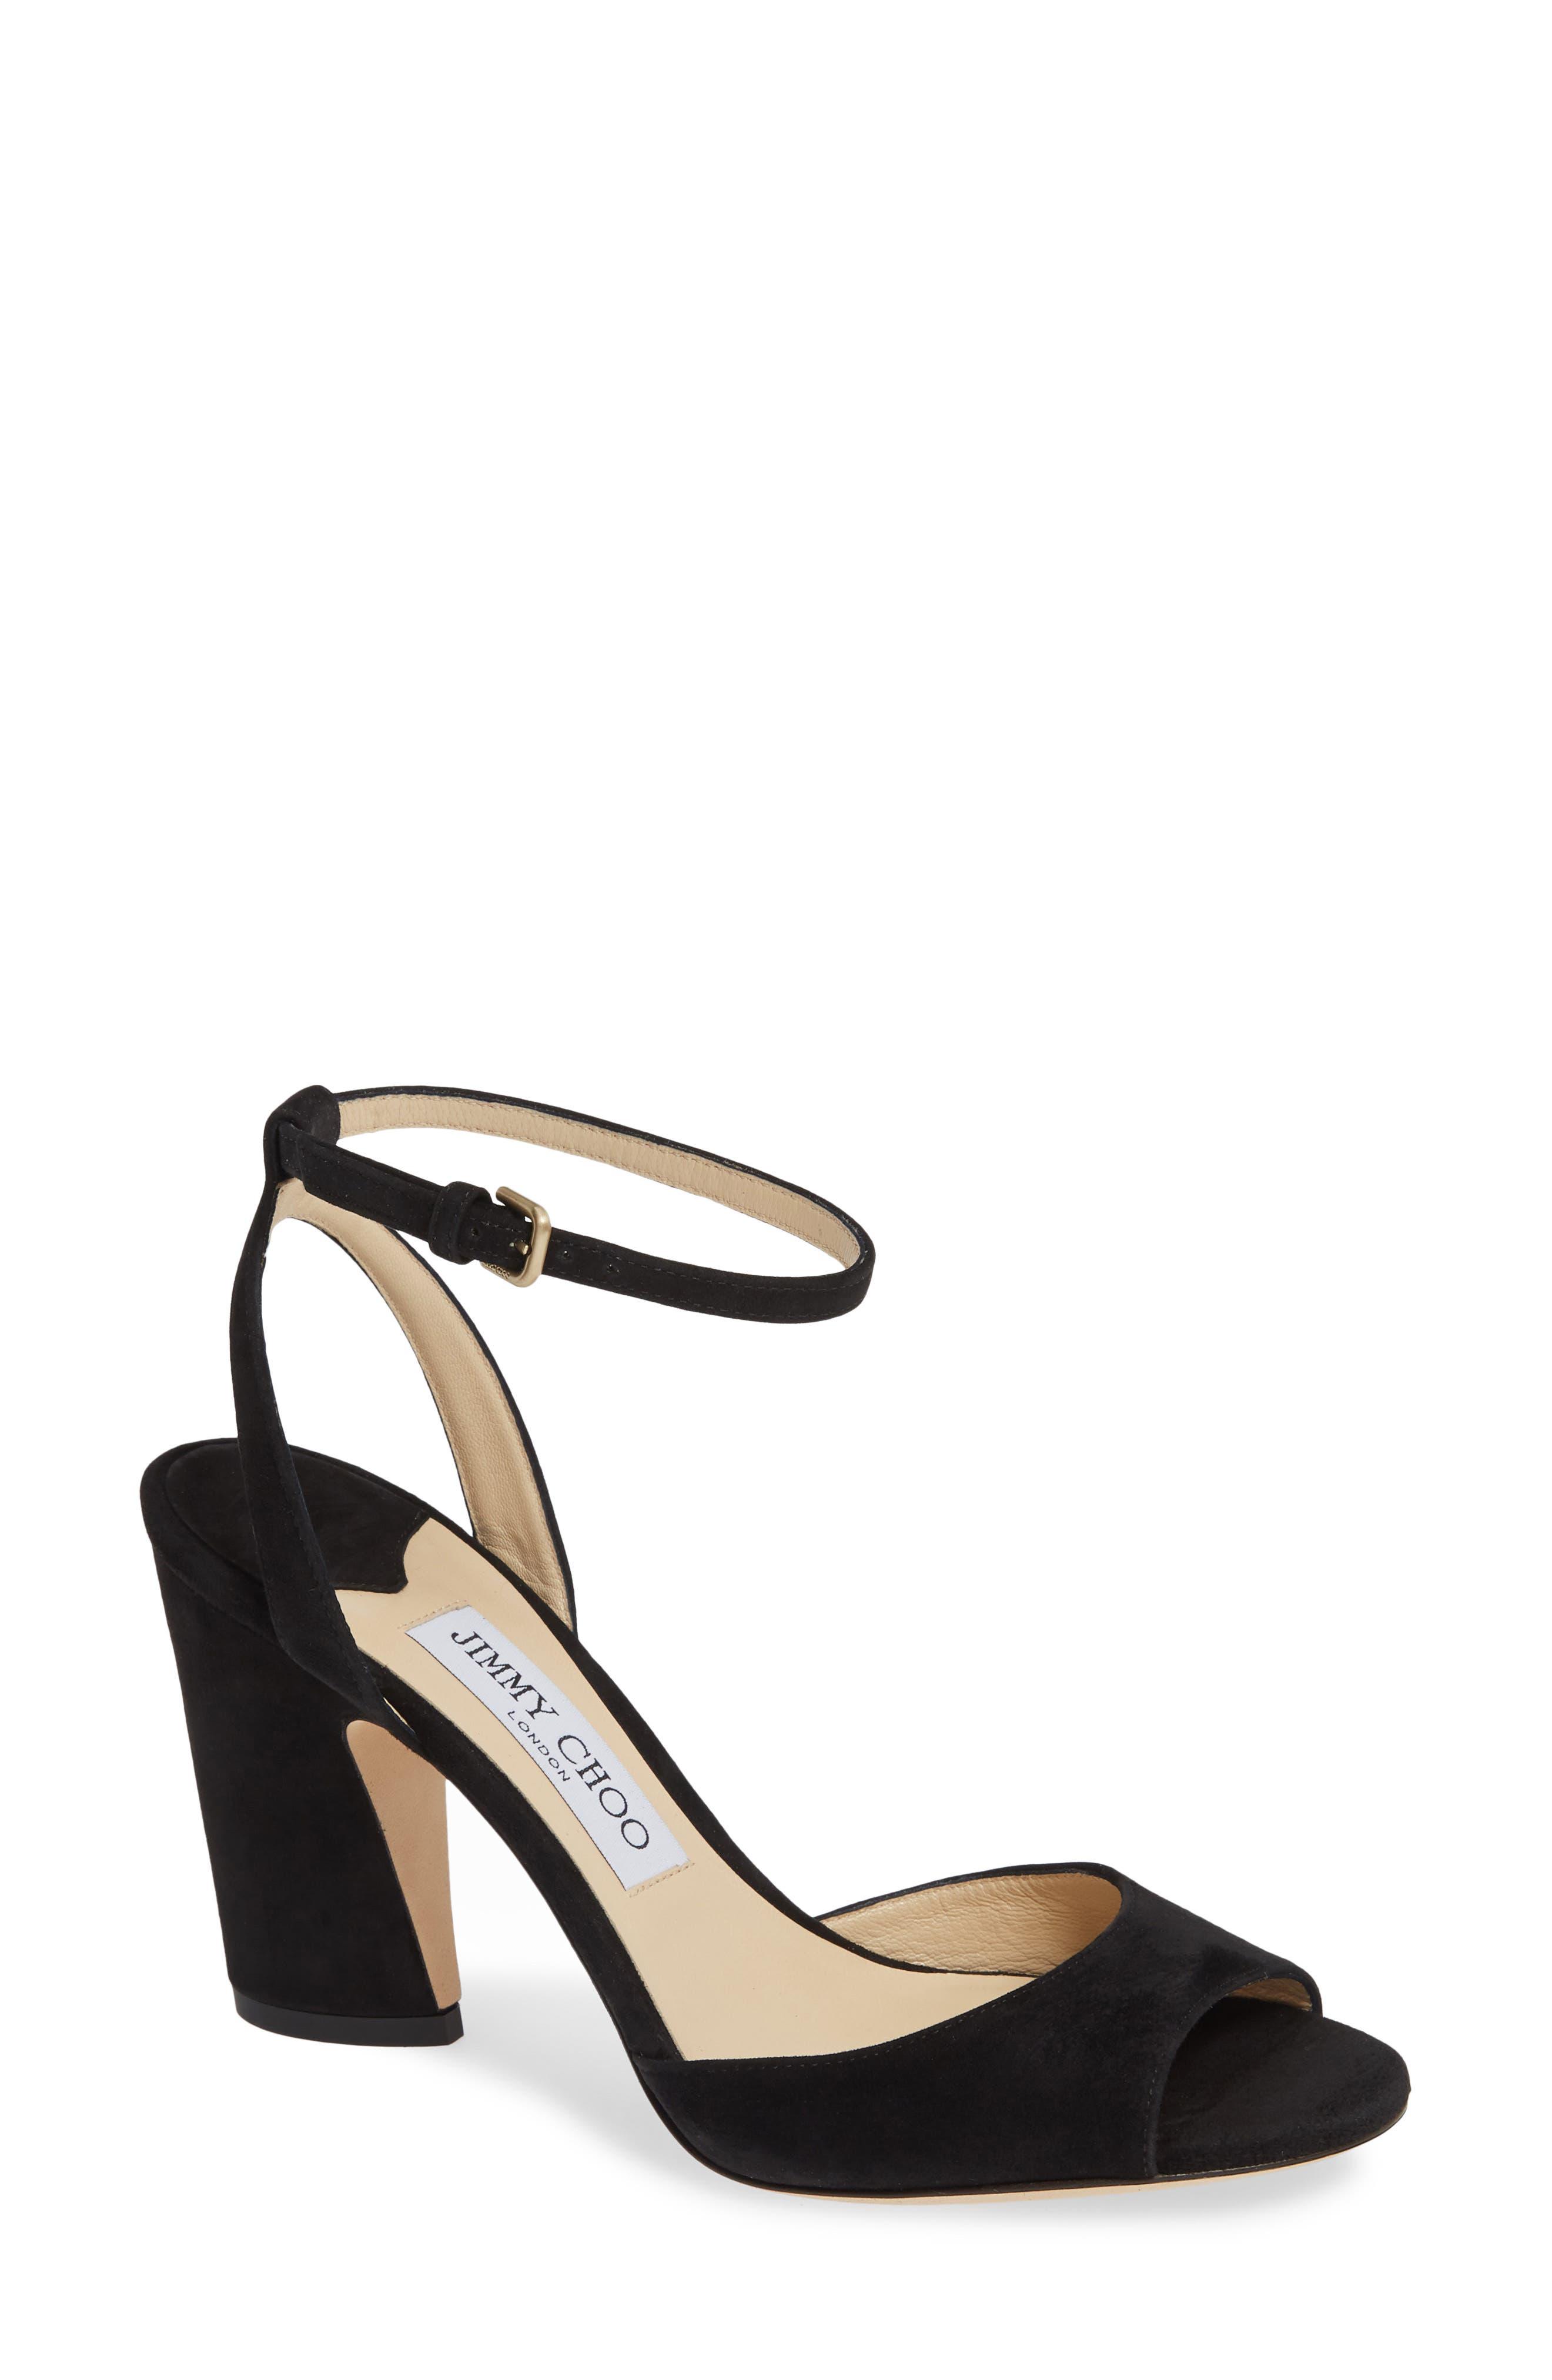 b6a0383deb1 Jimmy Choo Block-Heel Sandals for Women